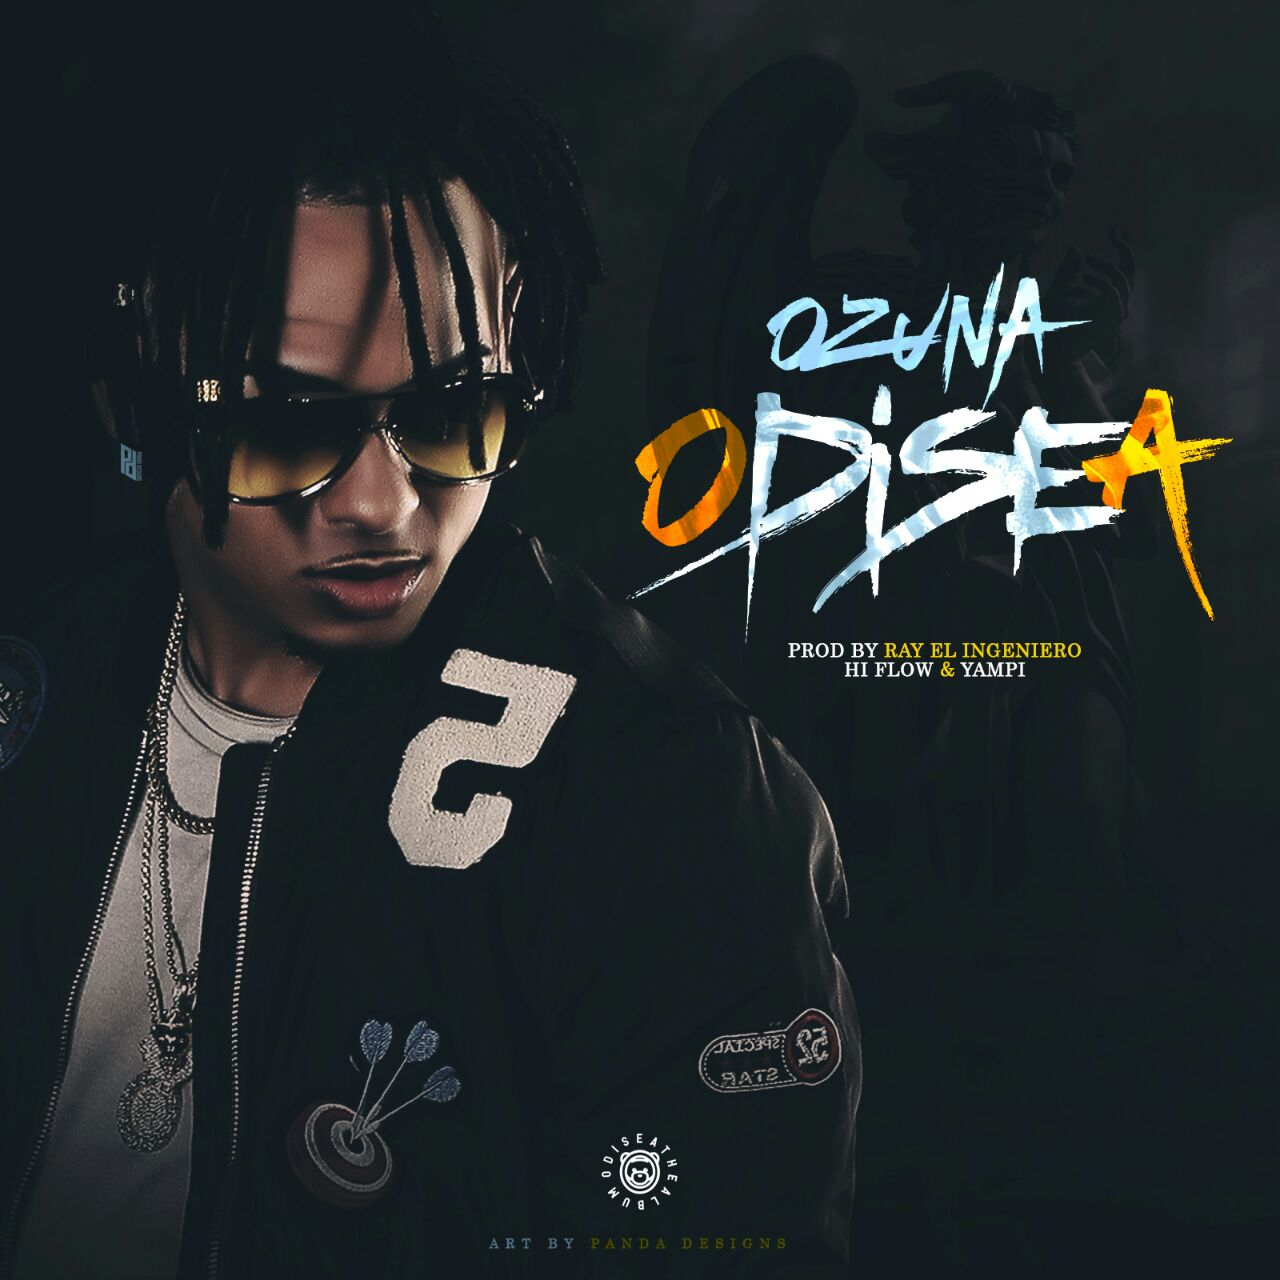 Ozuna - Odisea MP3